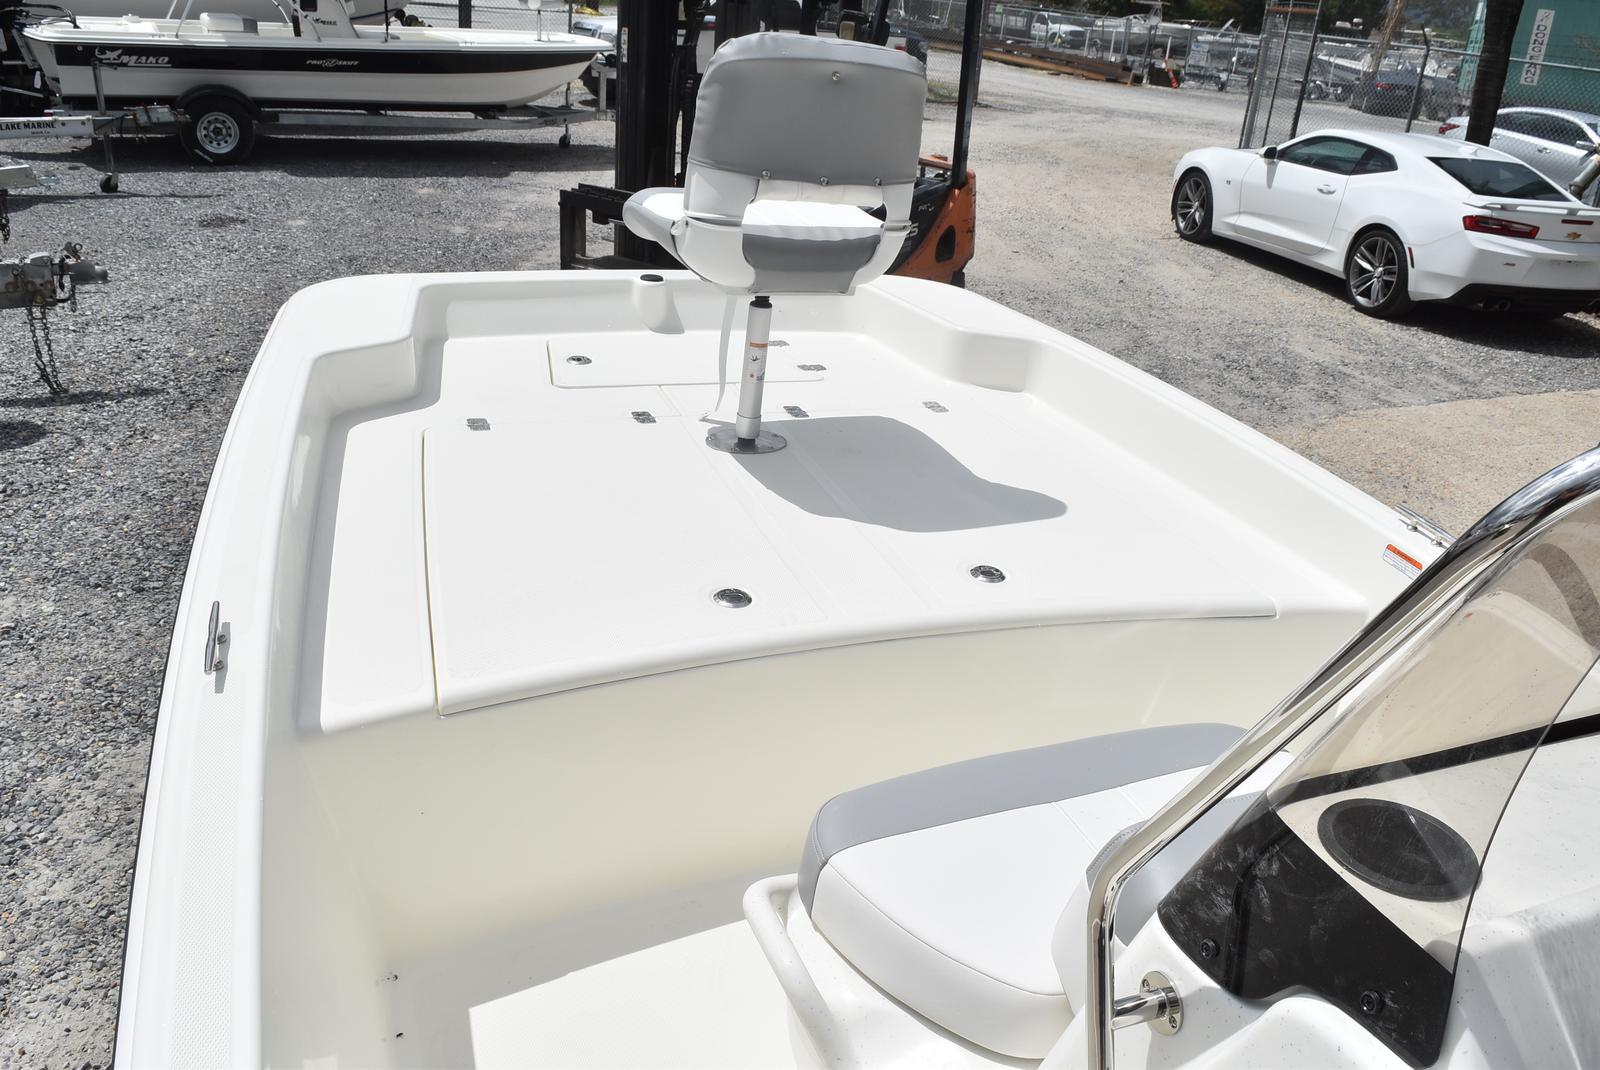 2020 Mako boat for sale, model of the boat is Pro Skiff 17, 75 ELPT & Image # 6 of 9